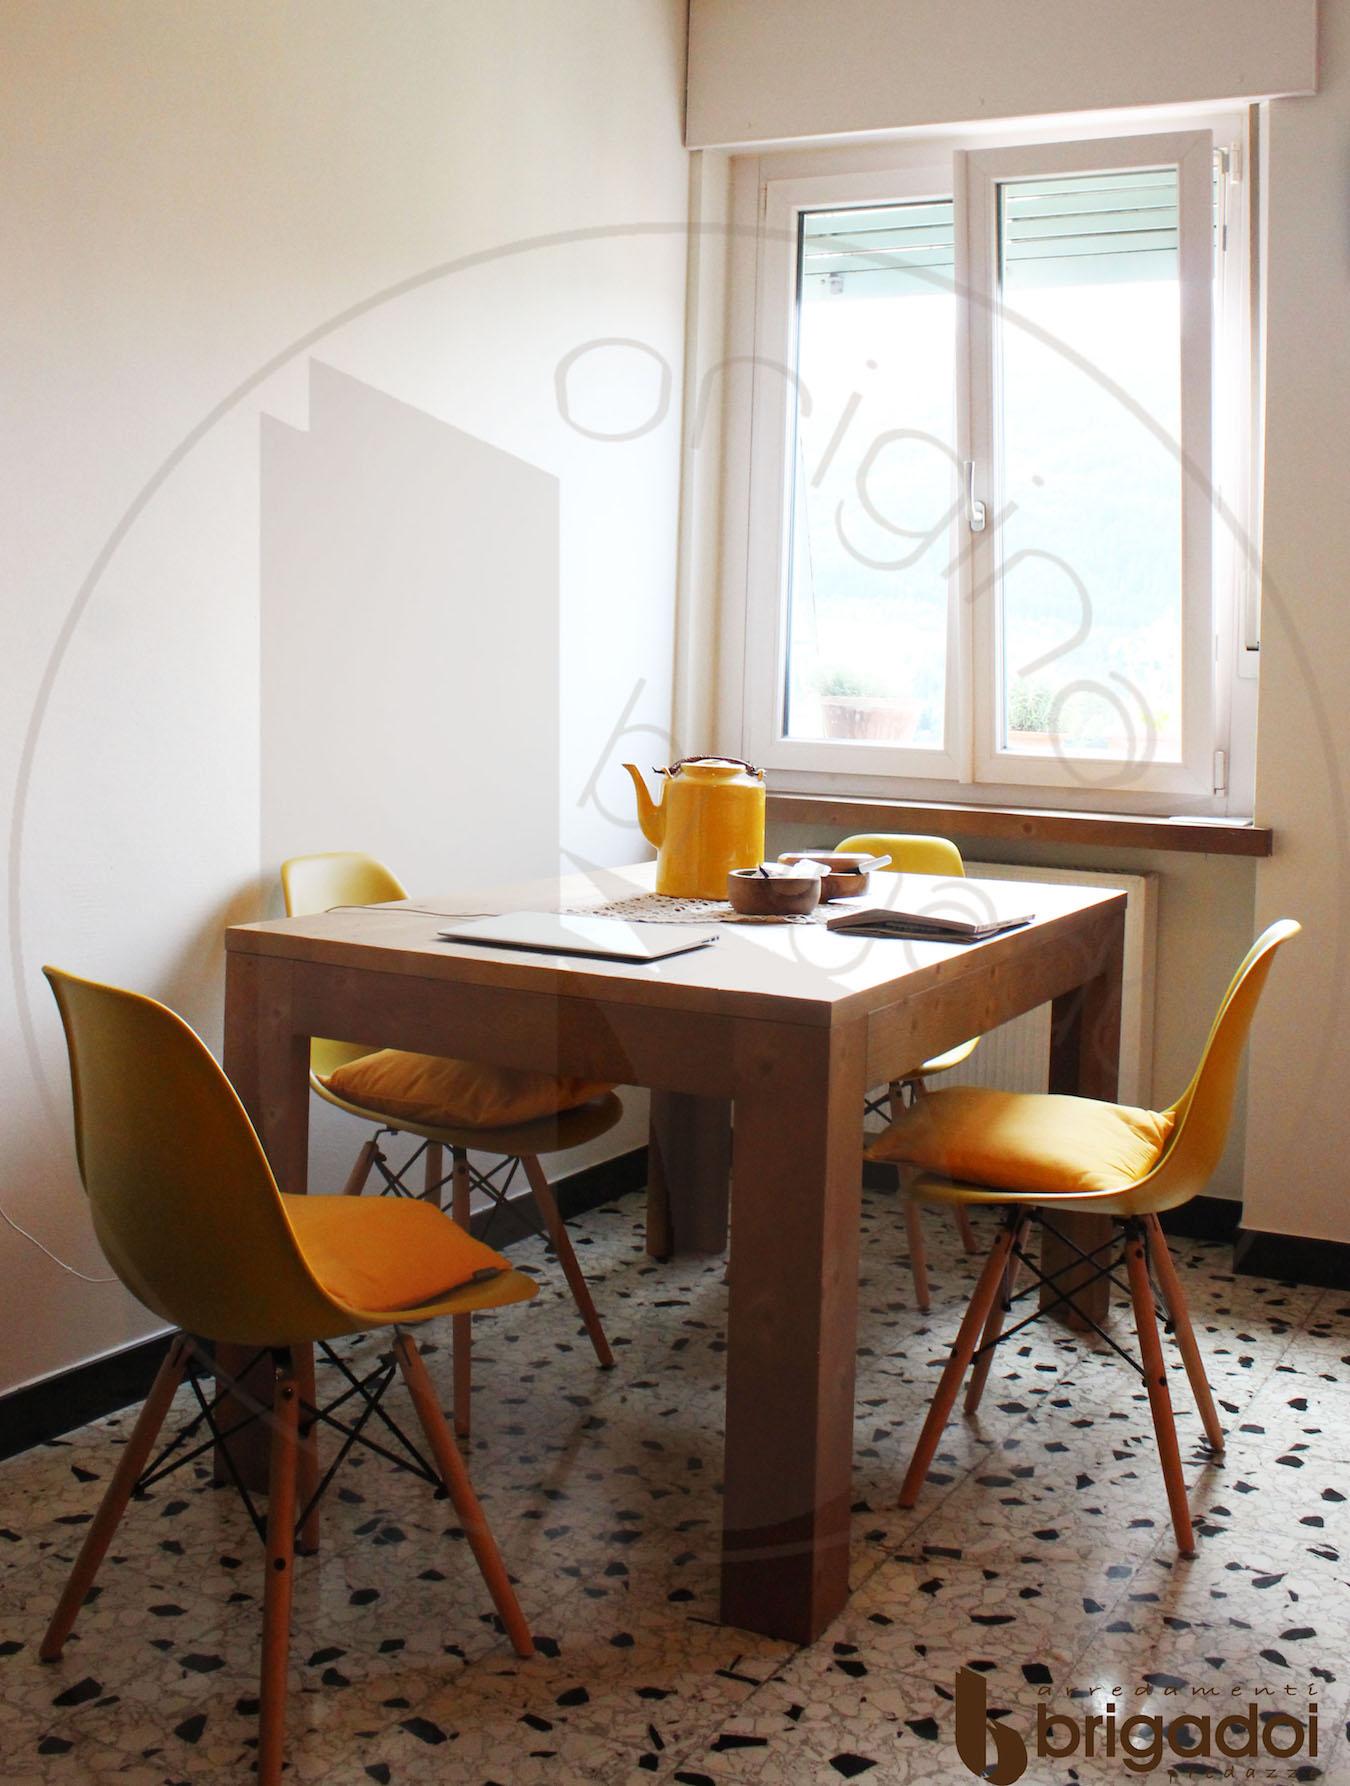 tavolo legno cucina moderna arredamenti brigadoi falegnameria val di fiemme trentino